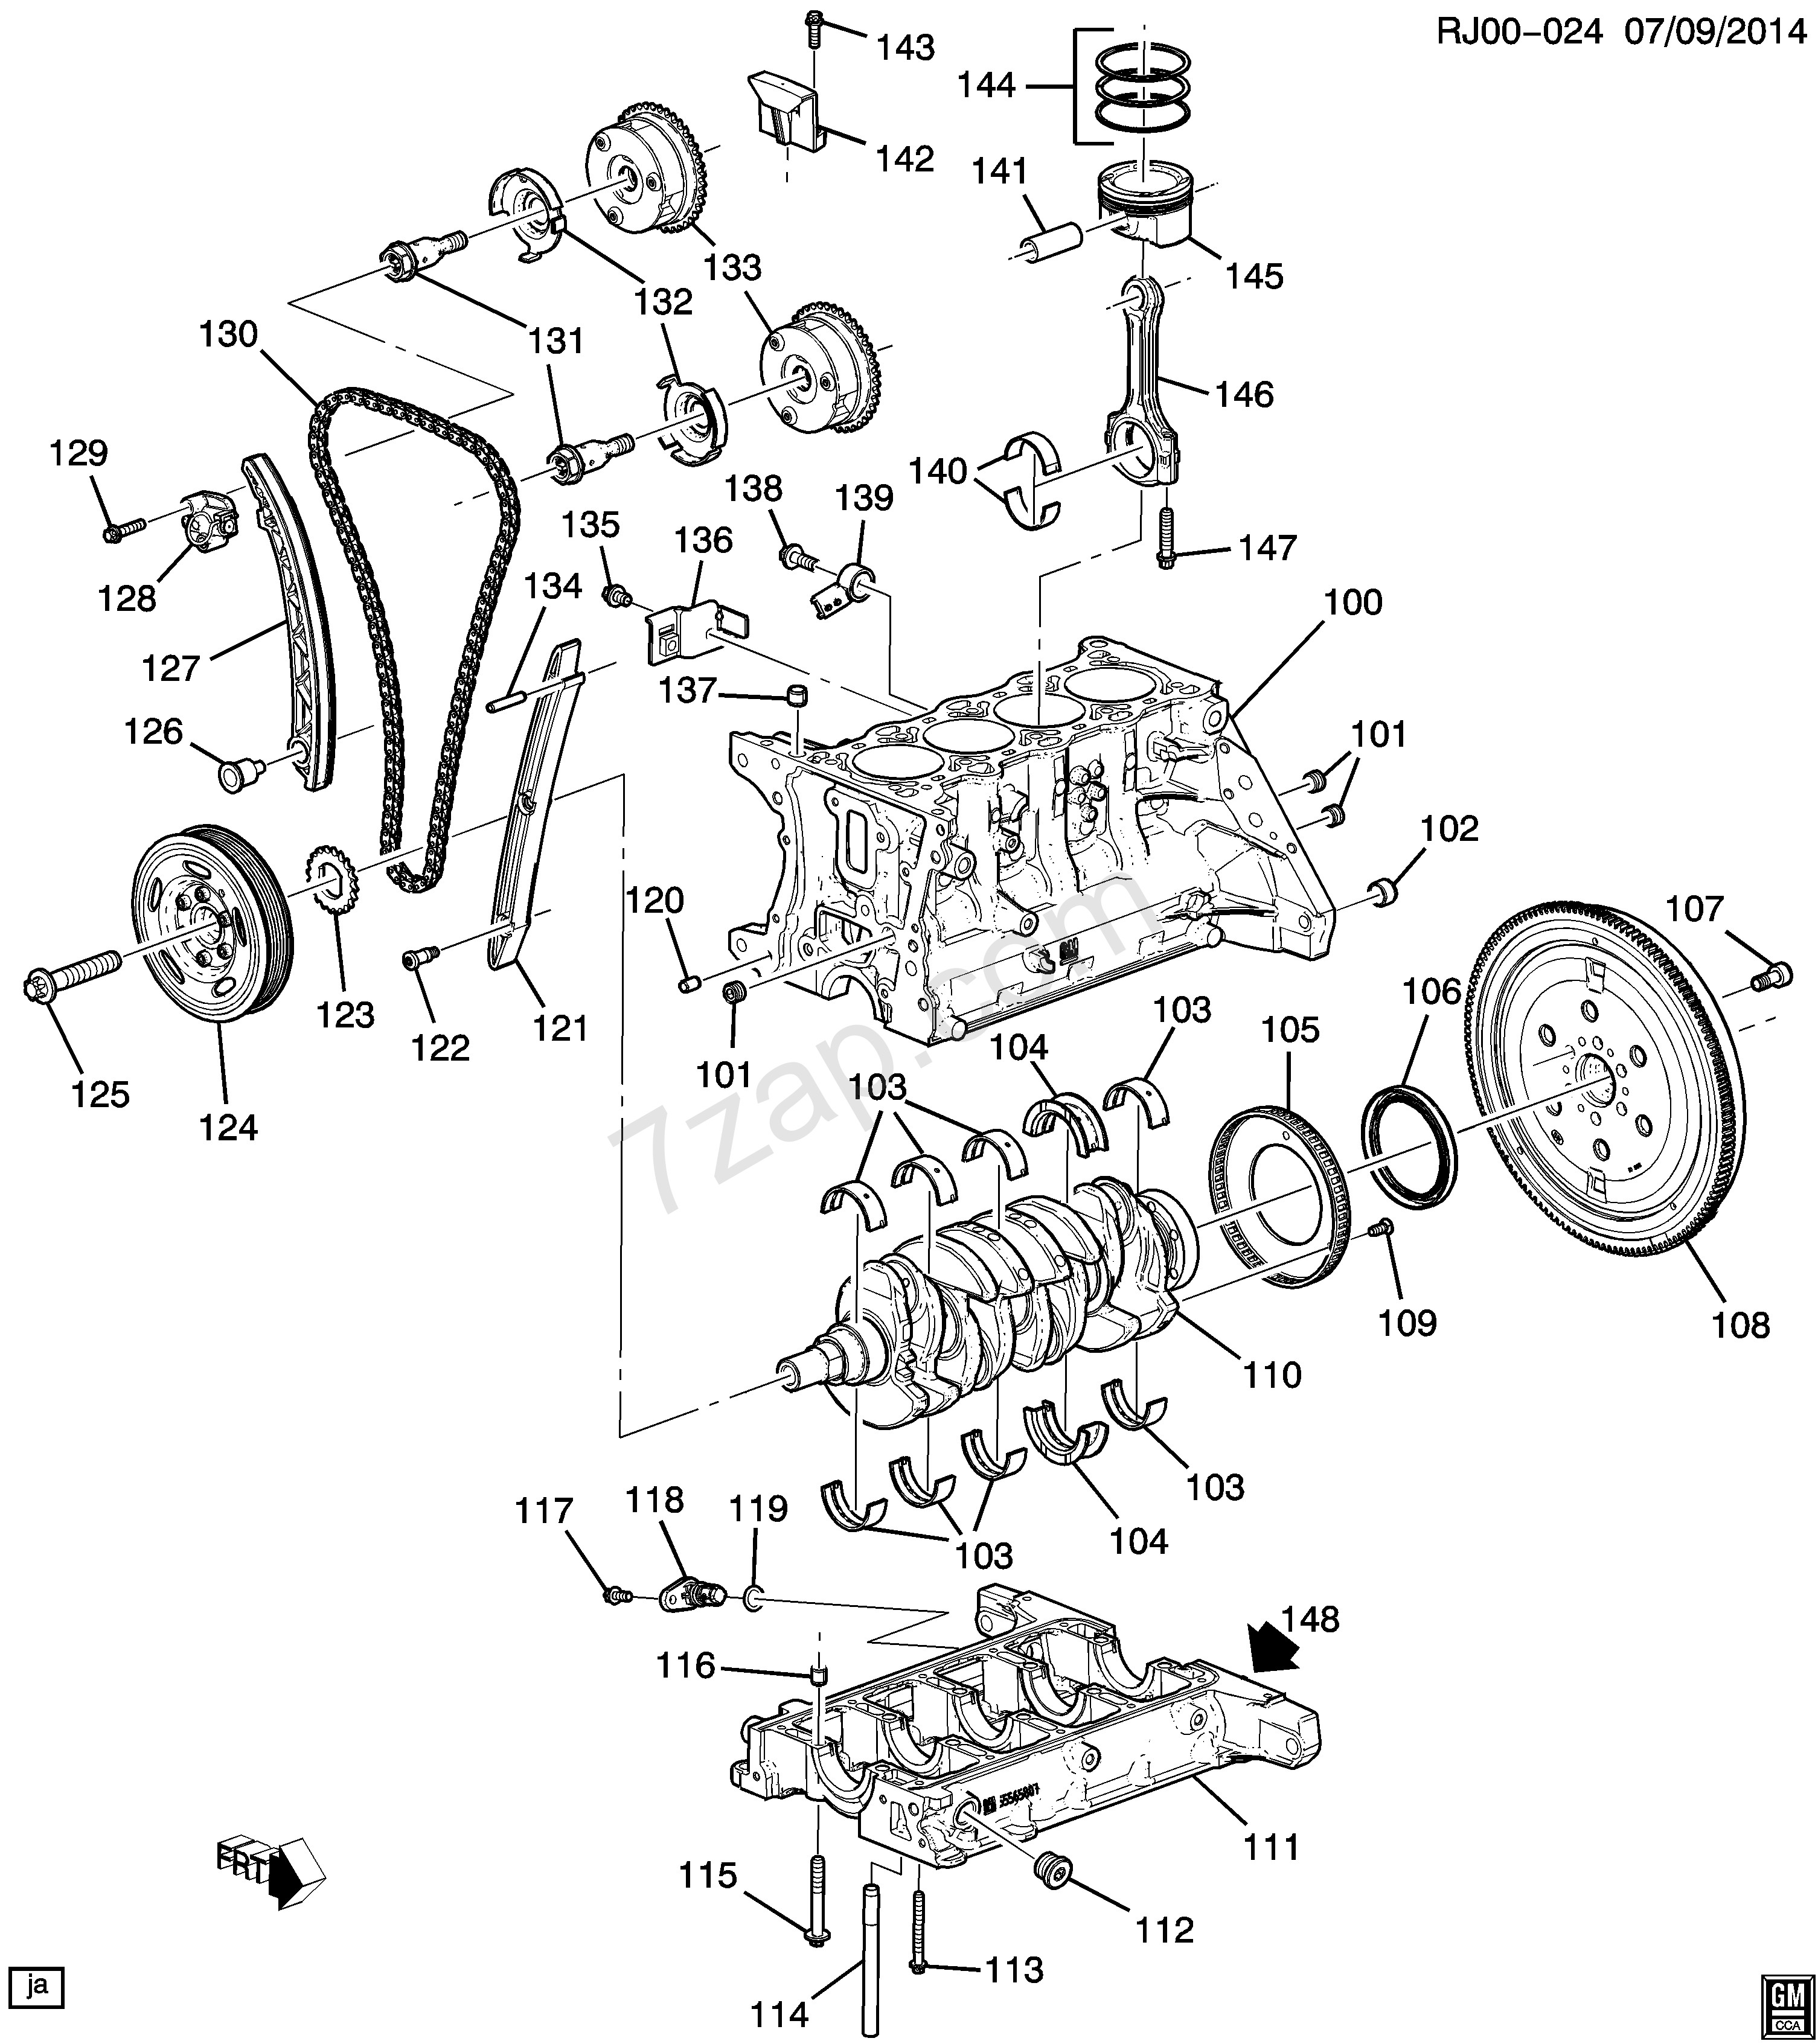 Chevy 3 1 Engine Diagram 2013 2017 Jc69 Engine asm 1 2l L4 Part 1 Cylinder Block & Internal Of Chevy 3 1 Engine Diagram